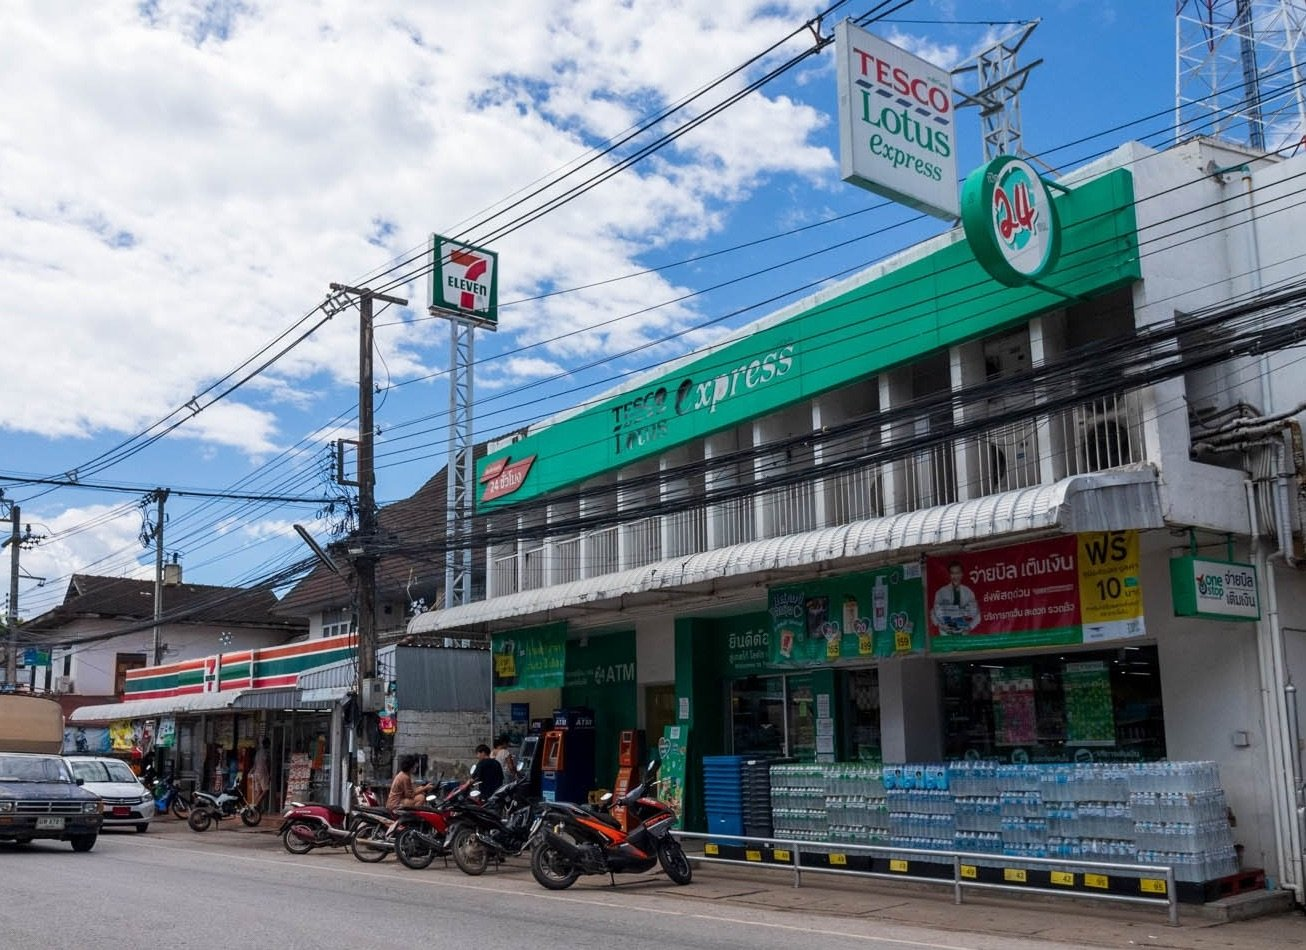 7-Eleven and Tesco Lotus Express - Choeng Doi, Doi Saket